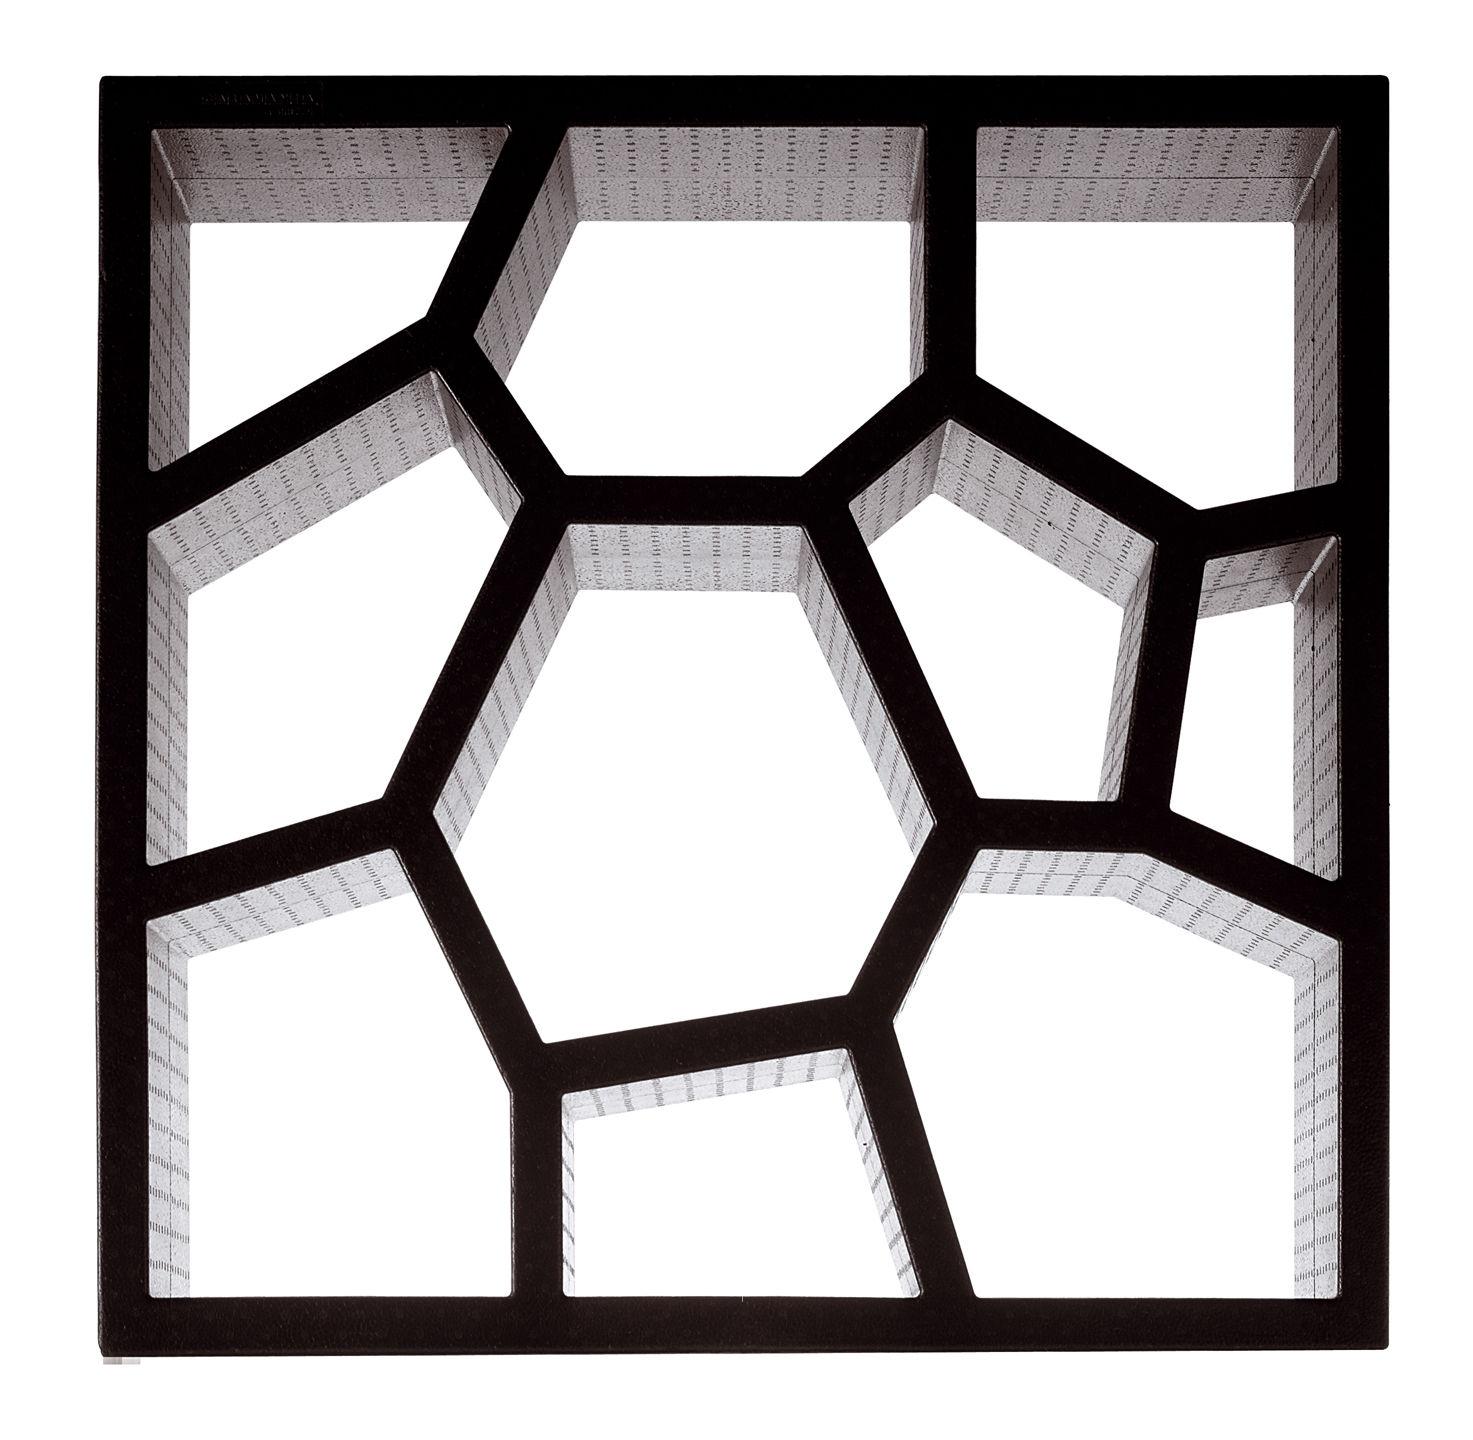 Honeycomb Bookshelf 1473 x 1440